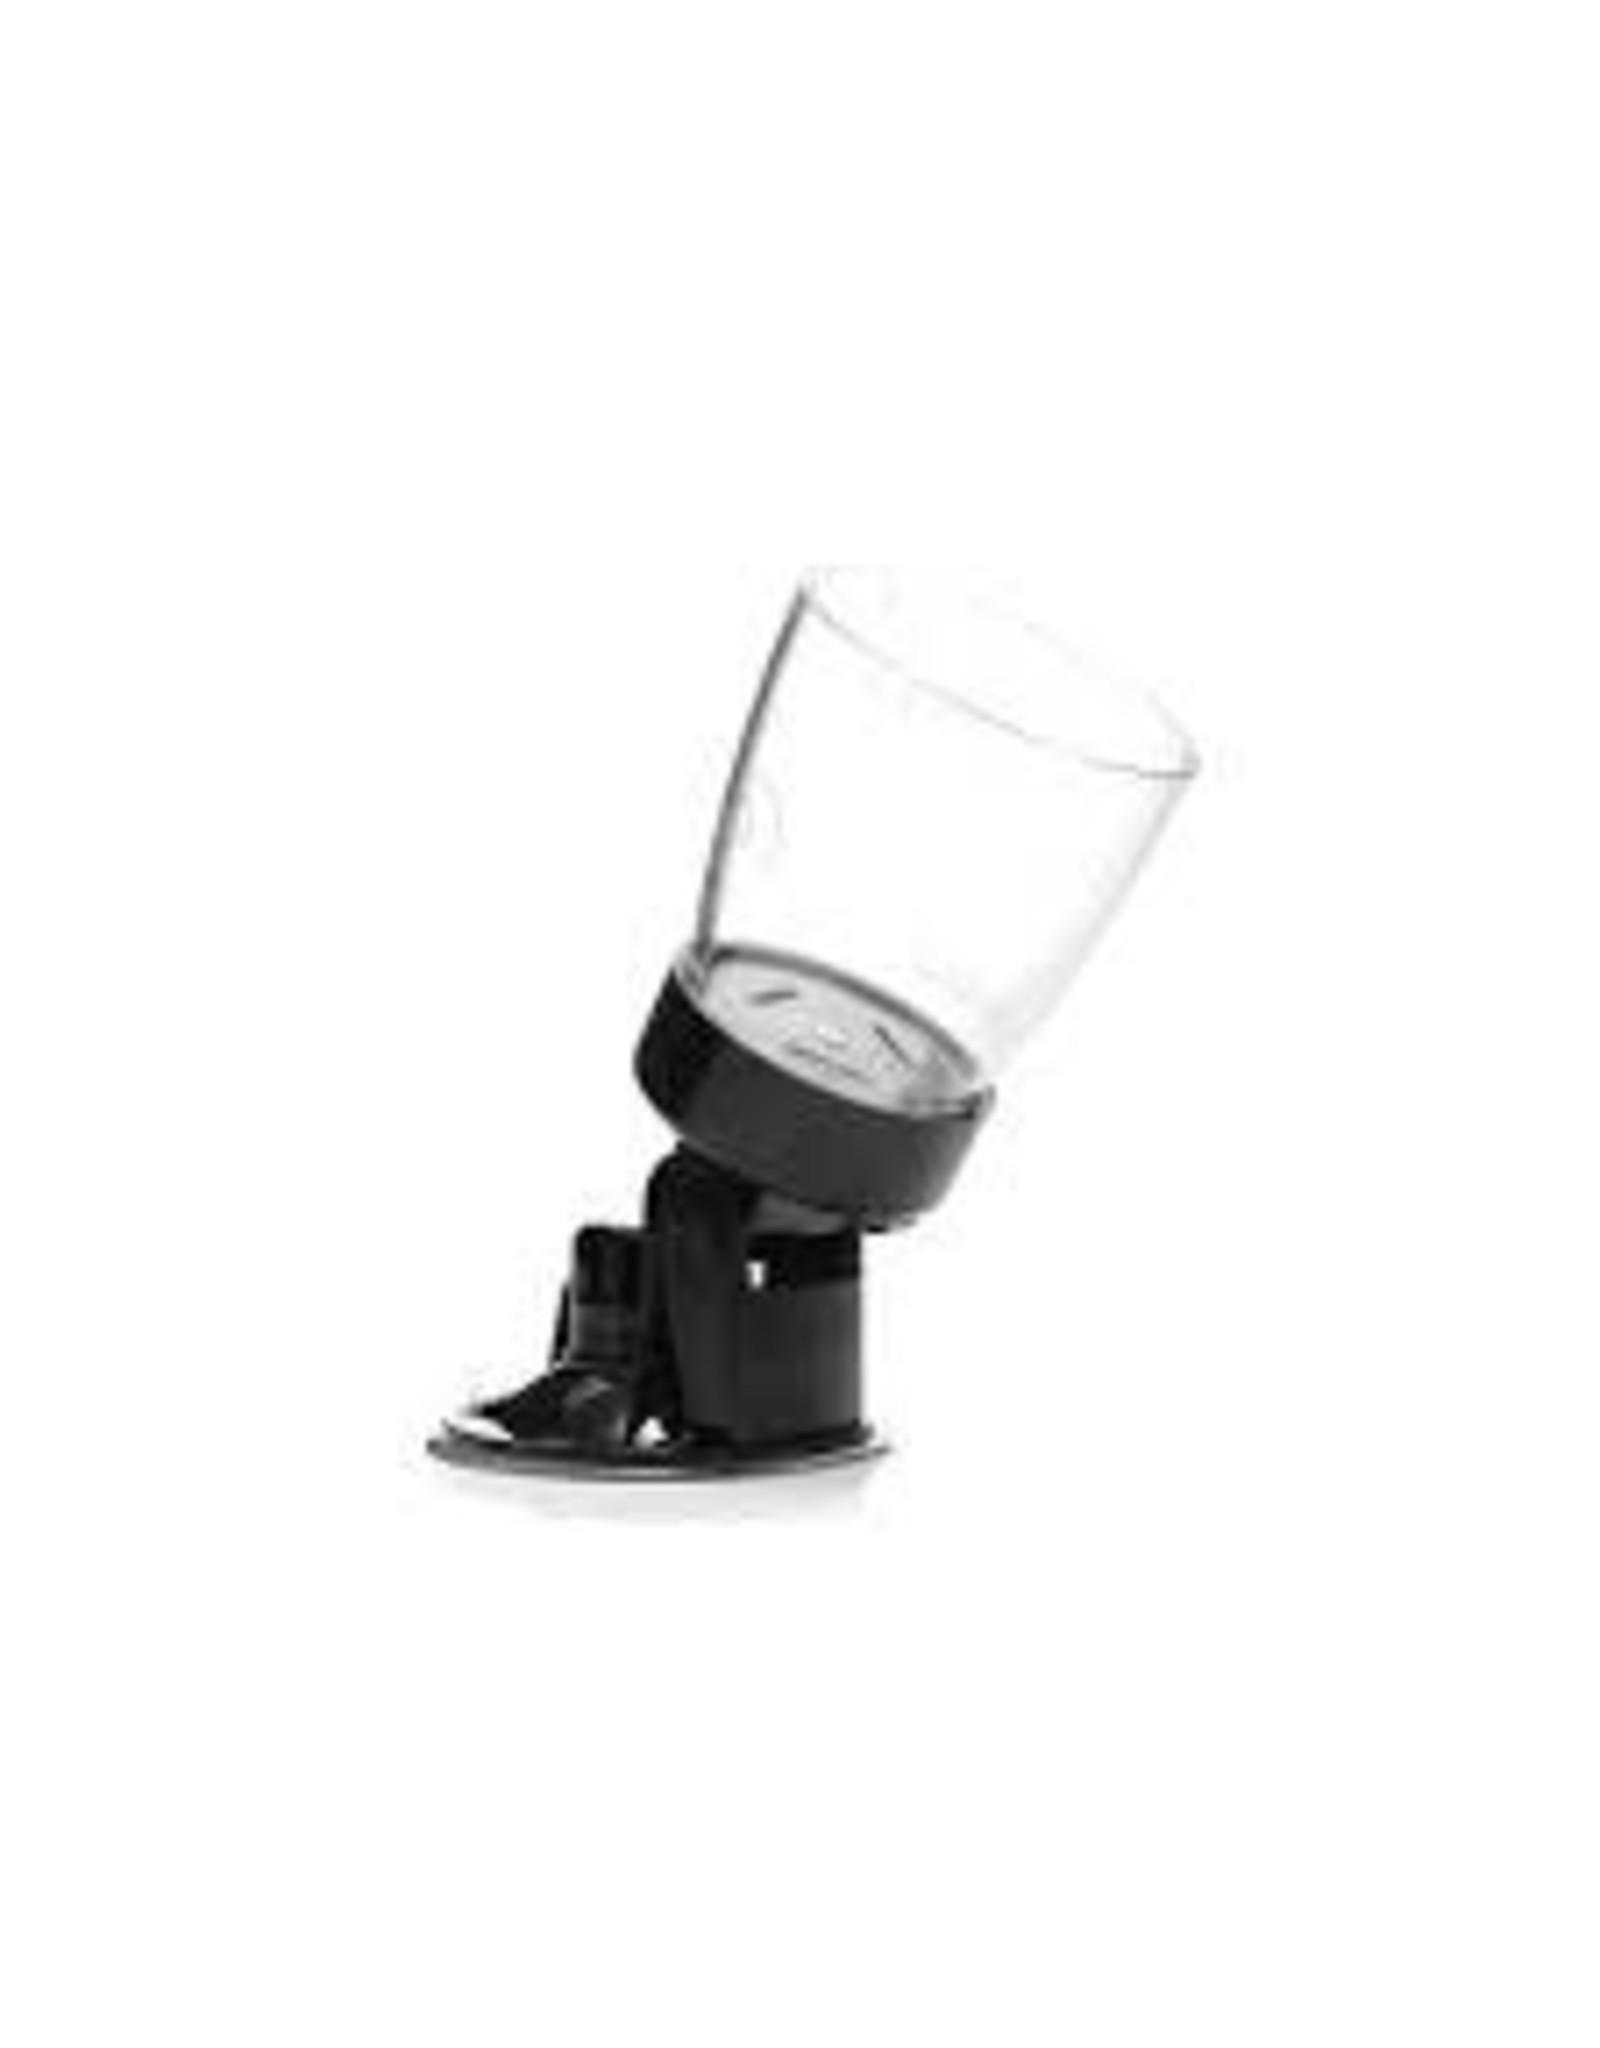 FLESHLIGHT - QUICKSHOT - SHOWER MOUNT ADAPTER